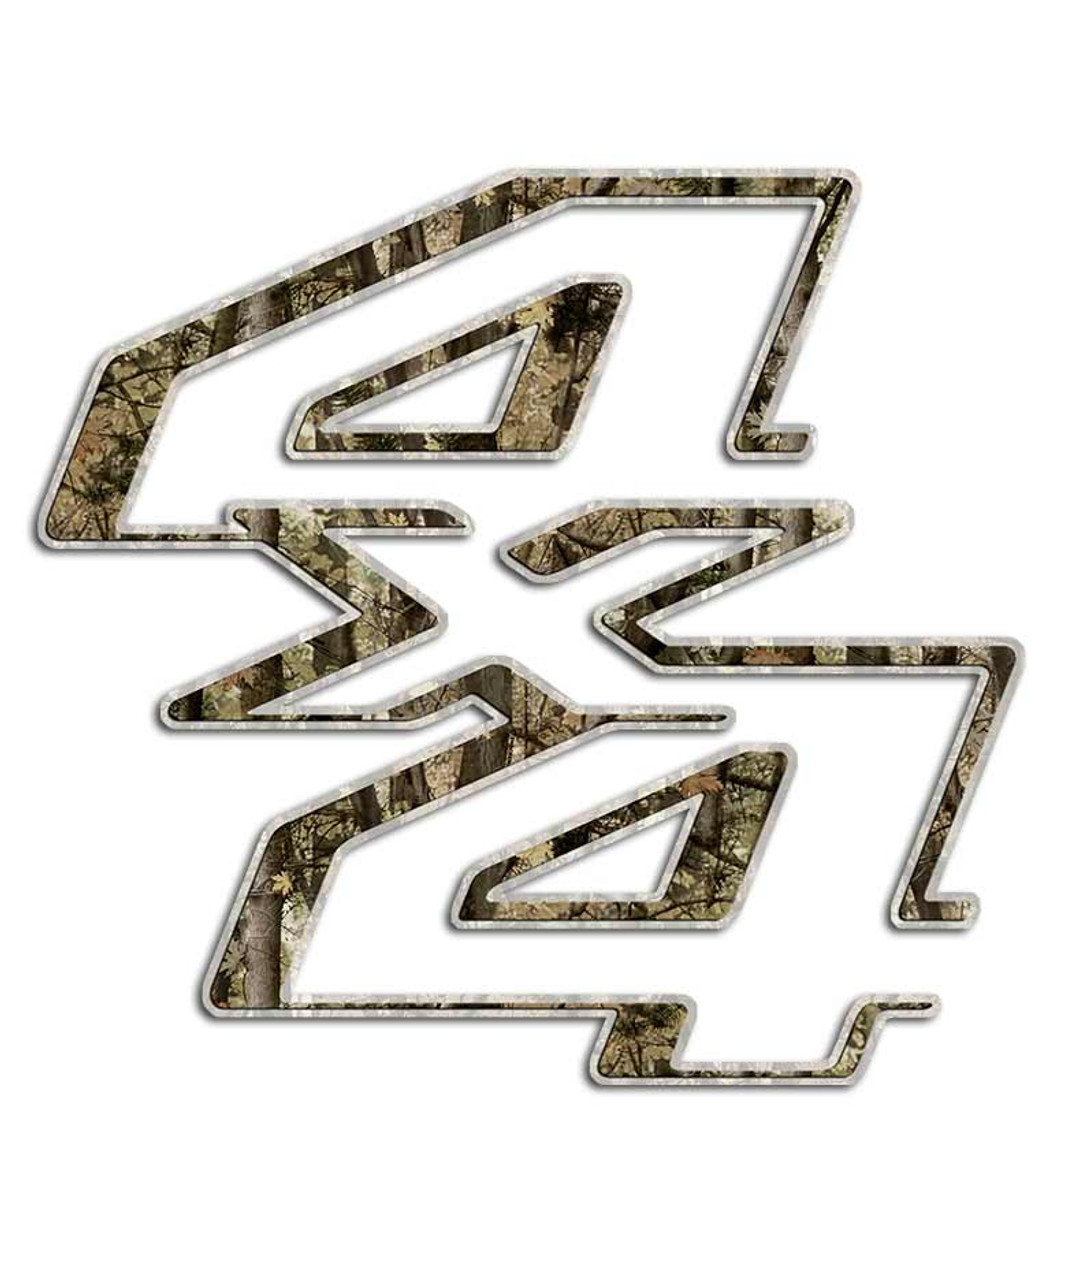 Ford Camouflage Truck Decals F 250 Super Duty Diesel Hunting Sticker